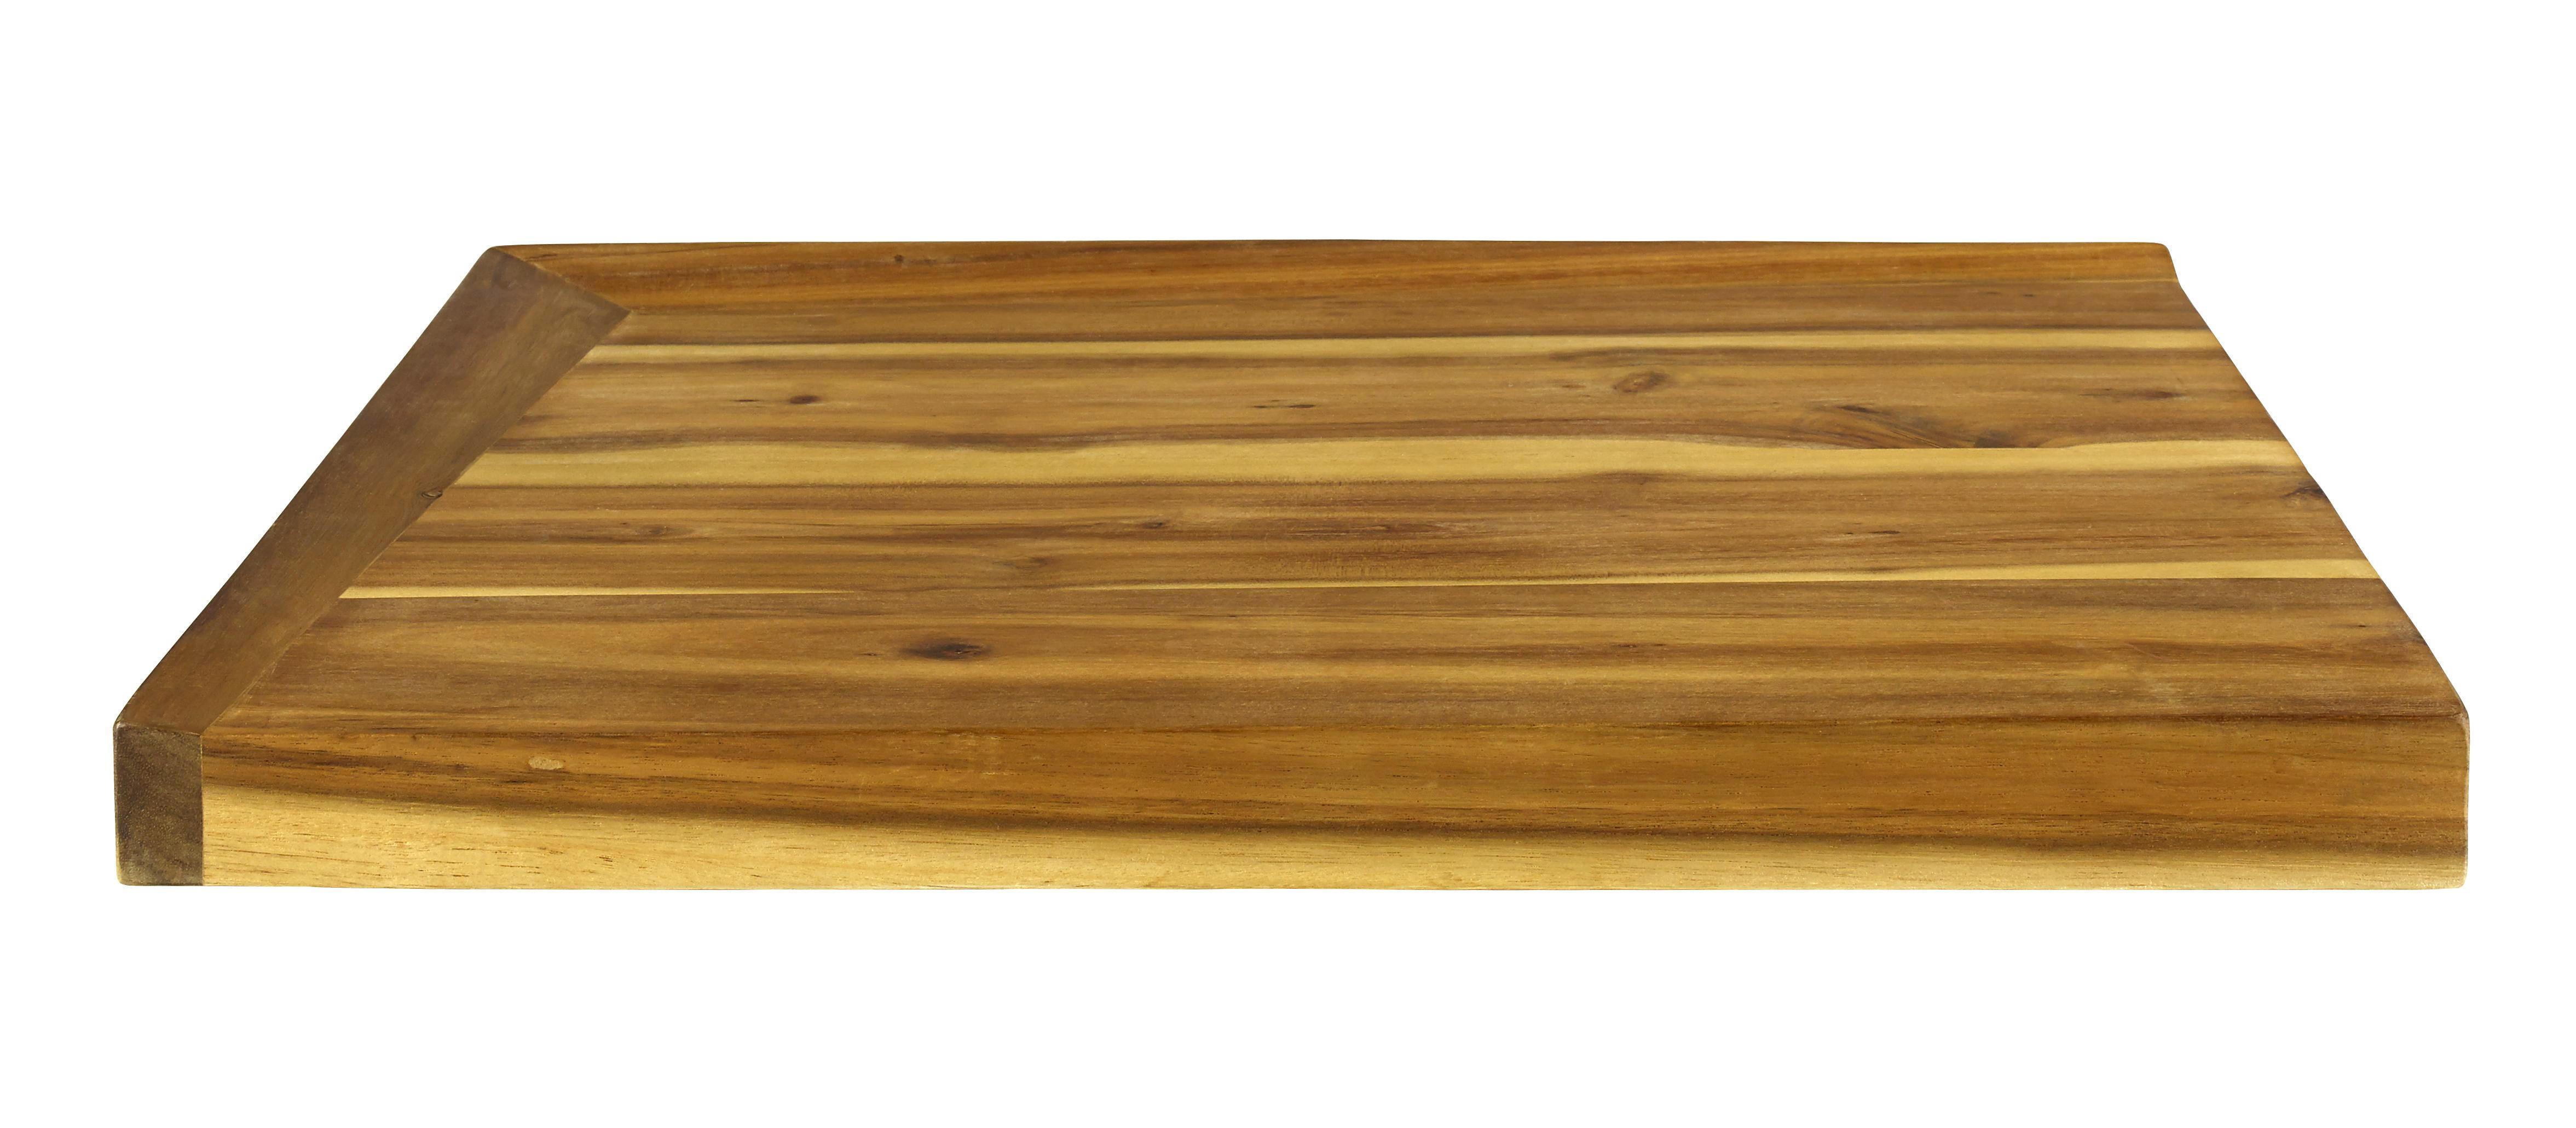 SCHNEIDEBRETT Holz Akazie - Naturfarben, LIFESTYLE, Holz (48/36,5/4cm) - HOMEWARE